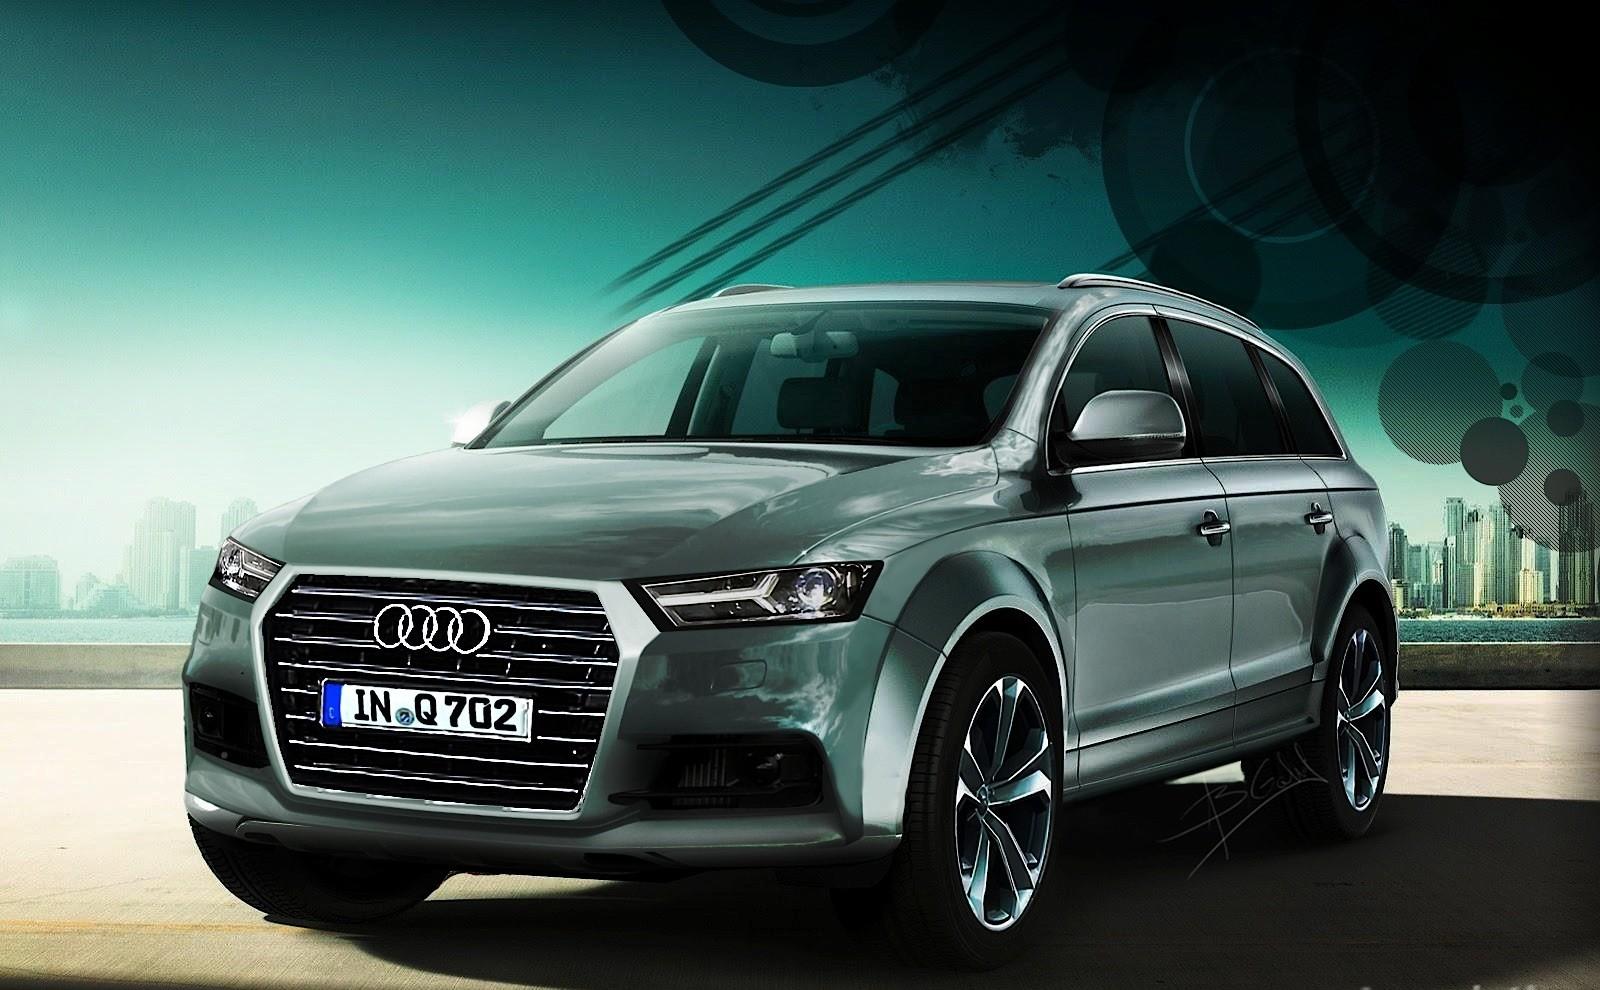 Старт продаж Audi SQ7 TDI в России намечен на ноябрь